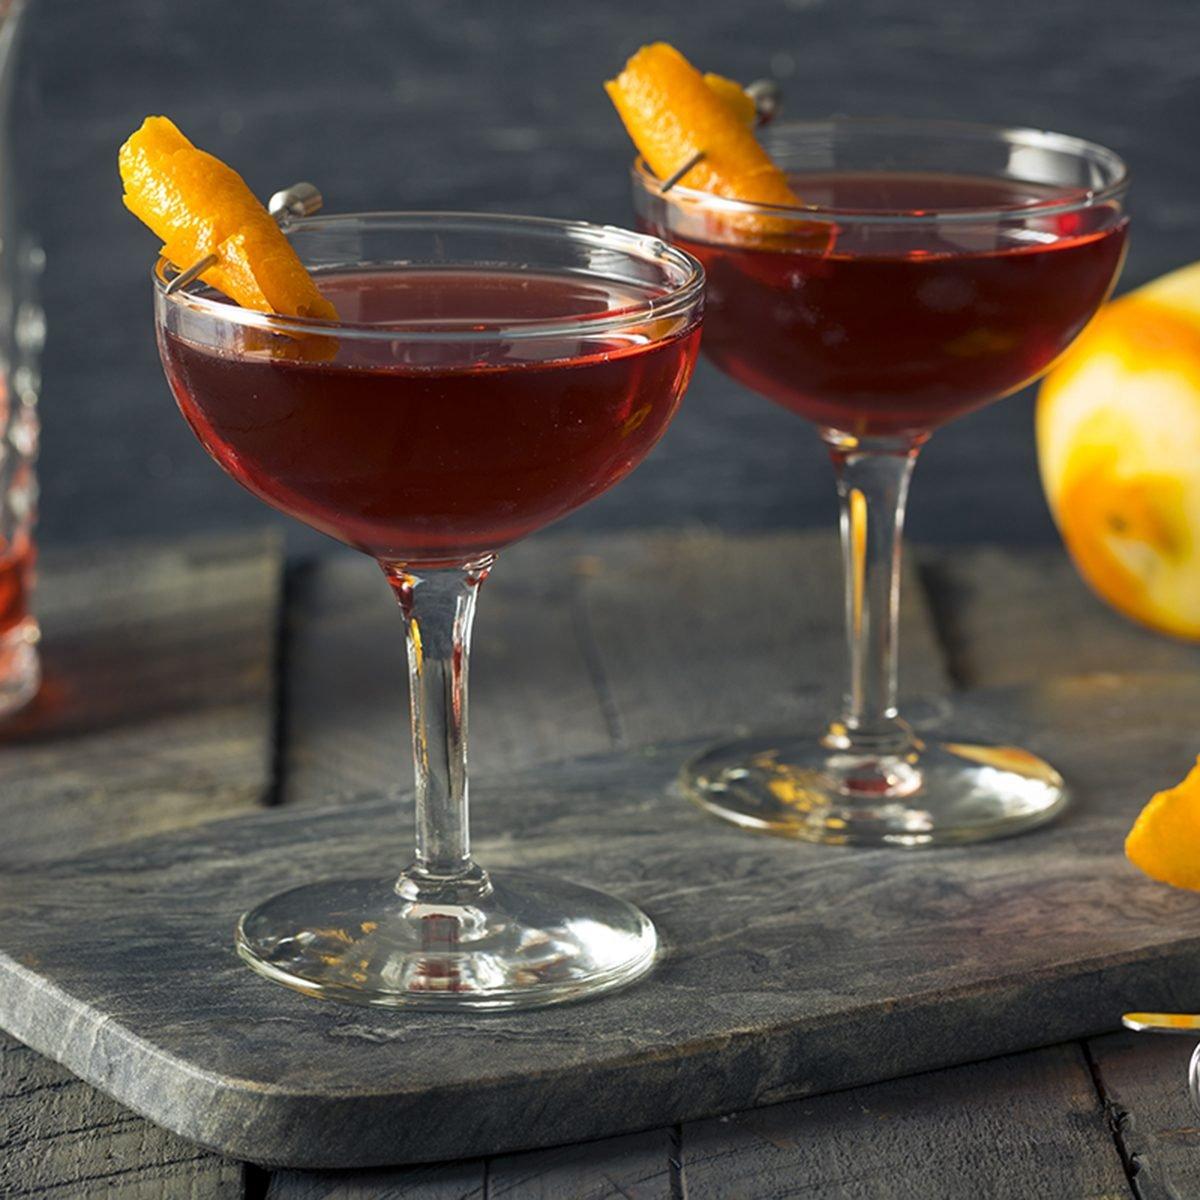 Homemade Red Boulevardier Cocktail with Orange Garnish